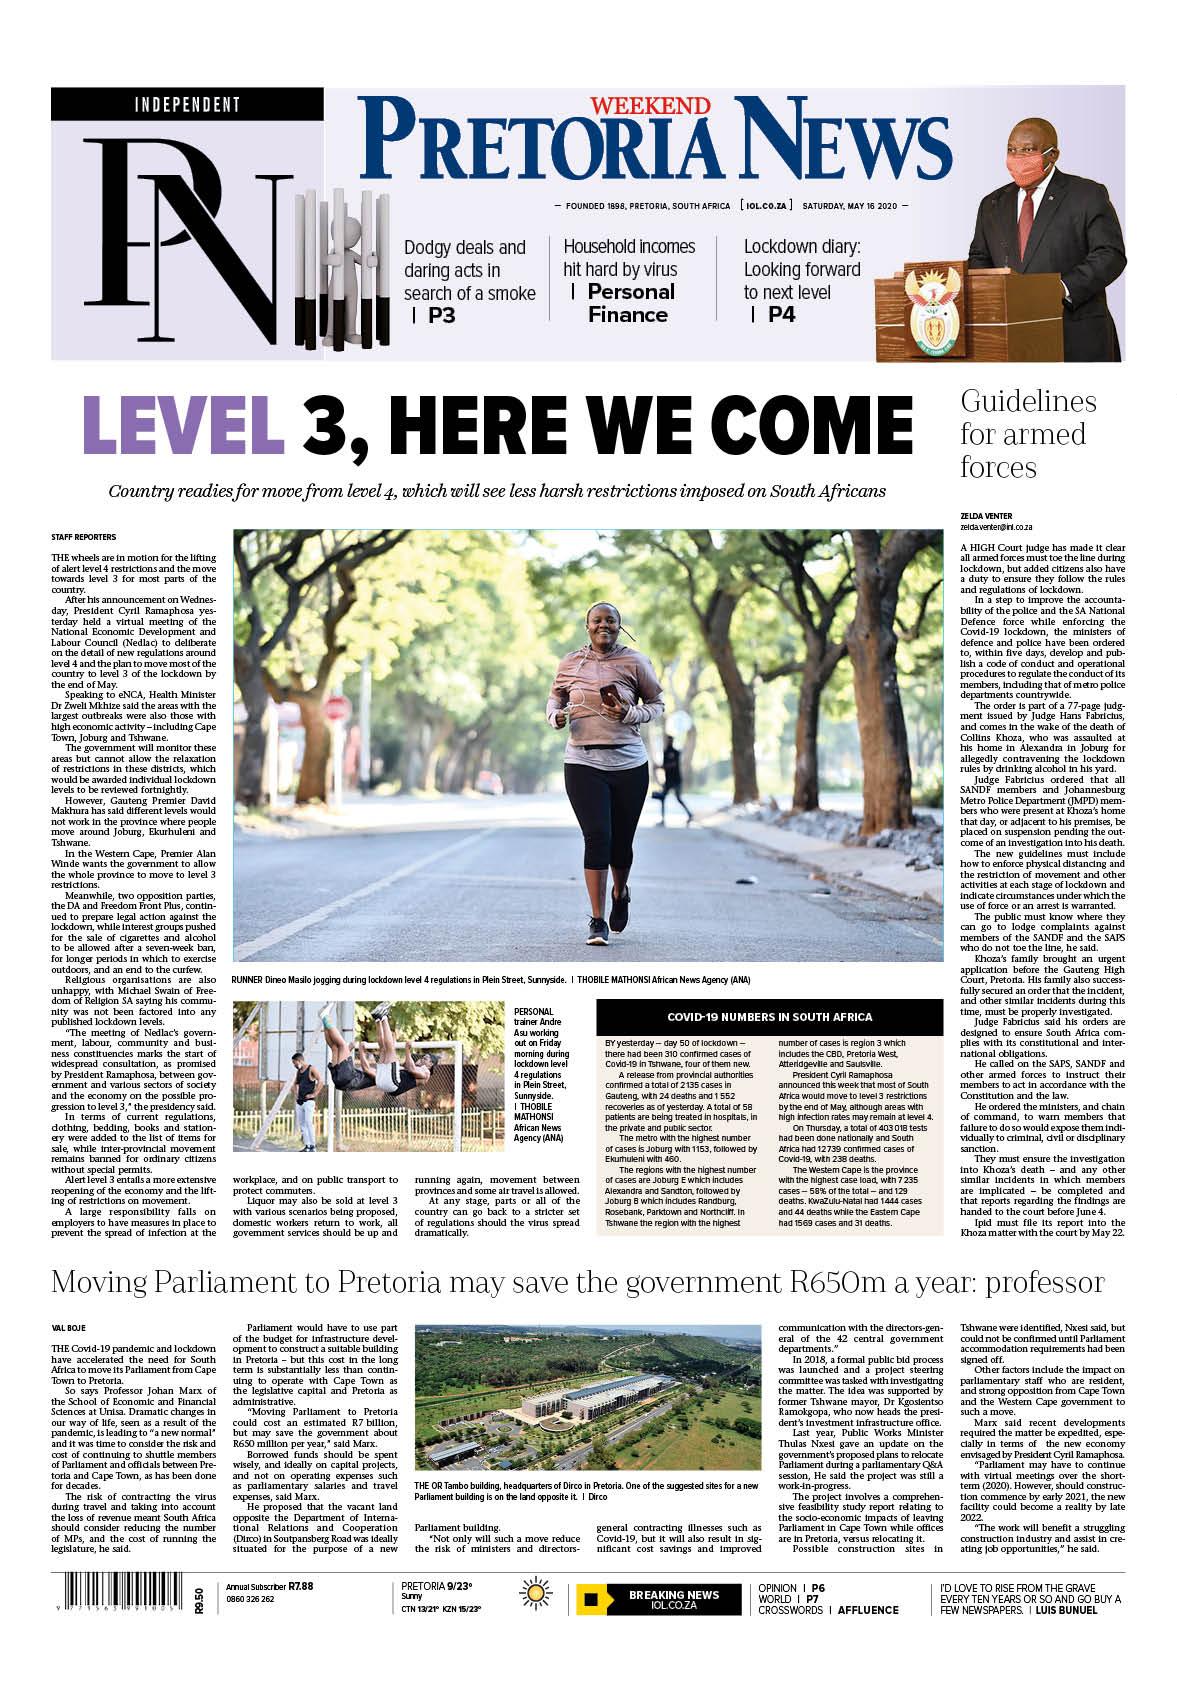 Pretoria News Weekend May 16 2020